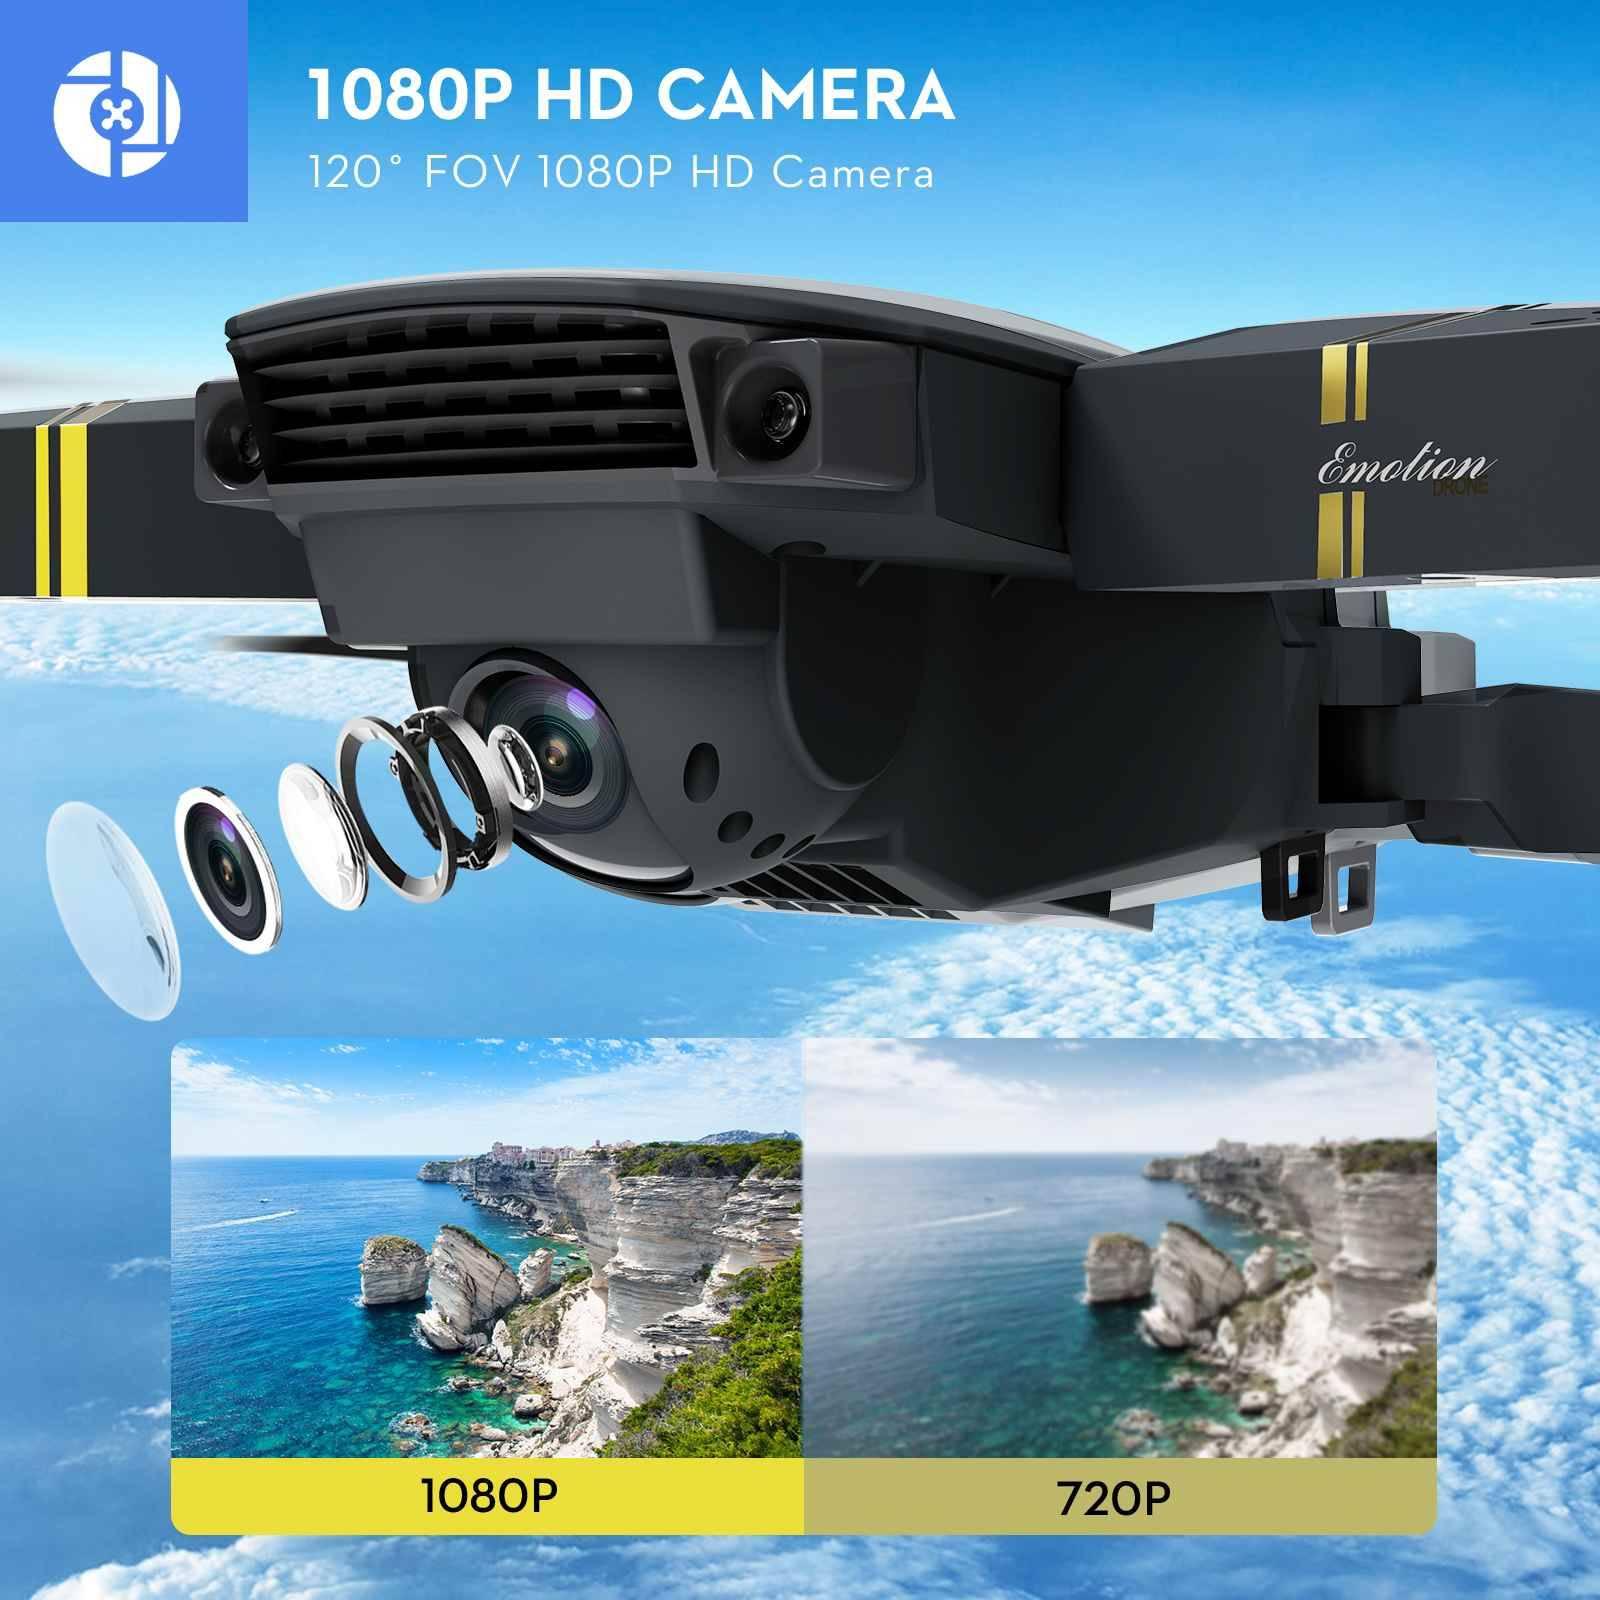 1080P/720P/480P Eachine E58 WIFI FPV